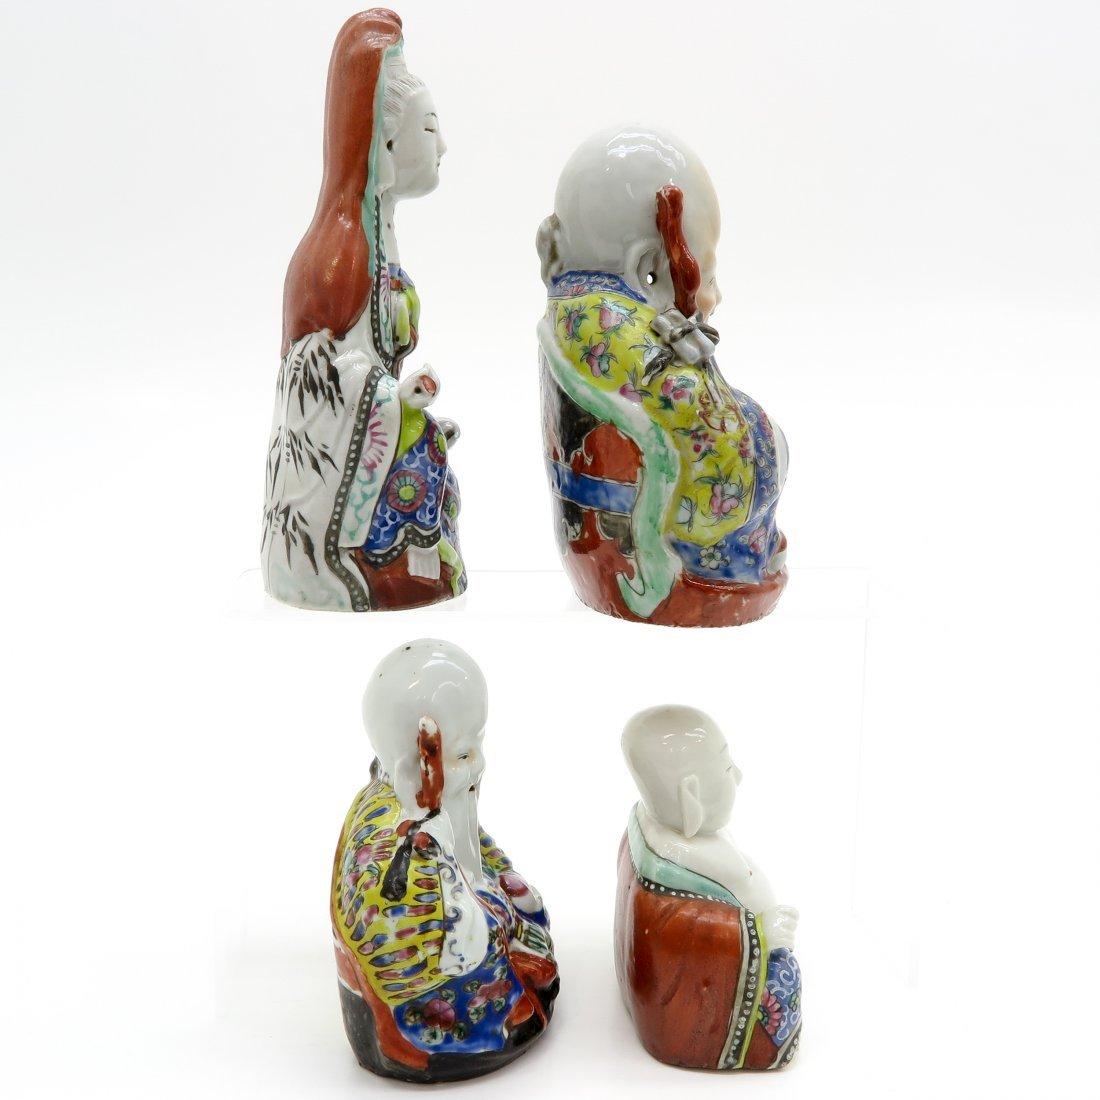 Loto f 4 China Porcelain Sculptures - 4